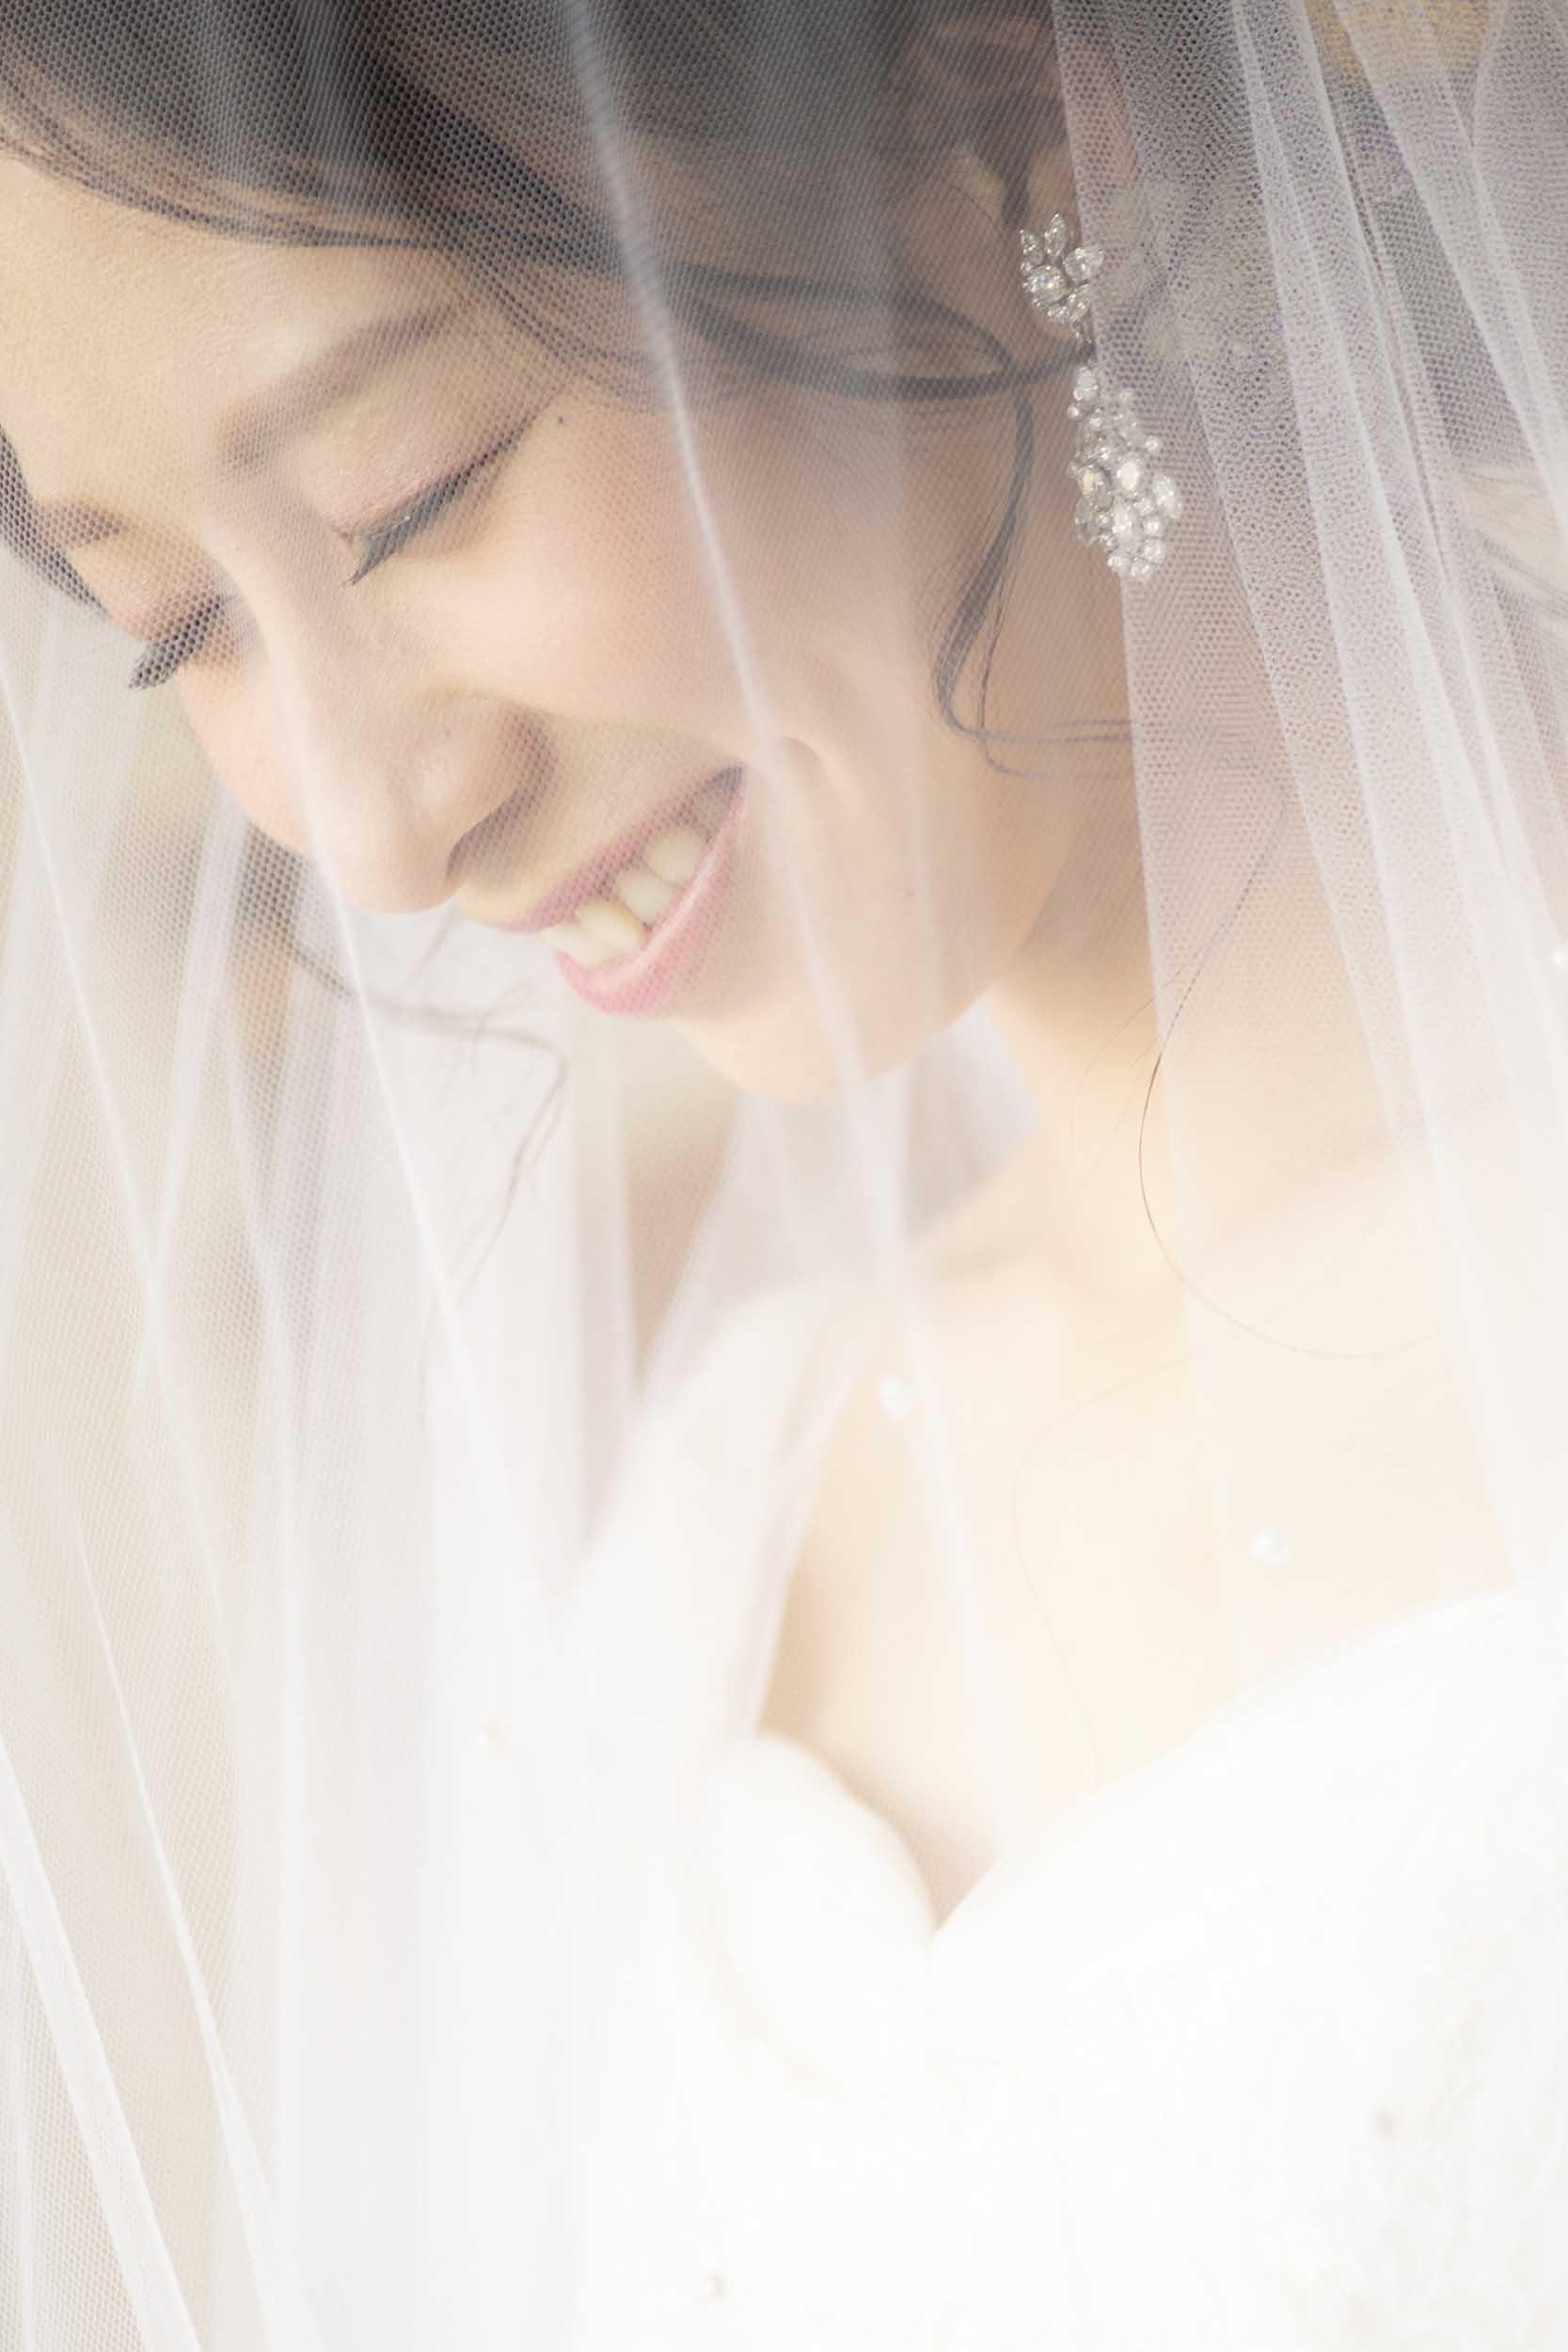 ppp_okuma_select_0009